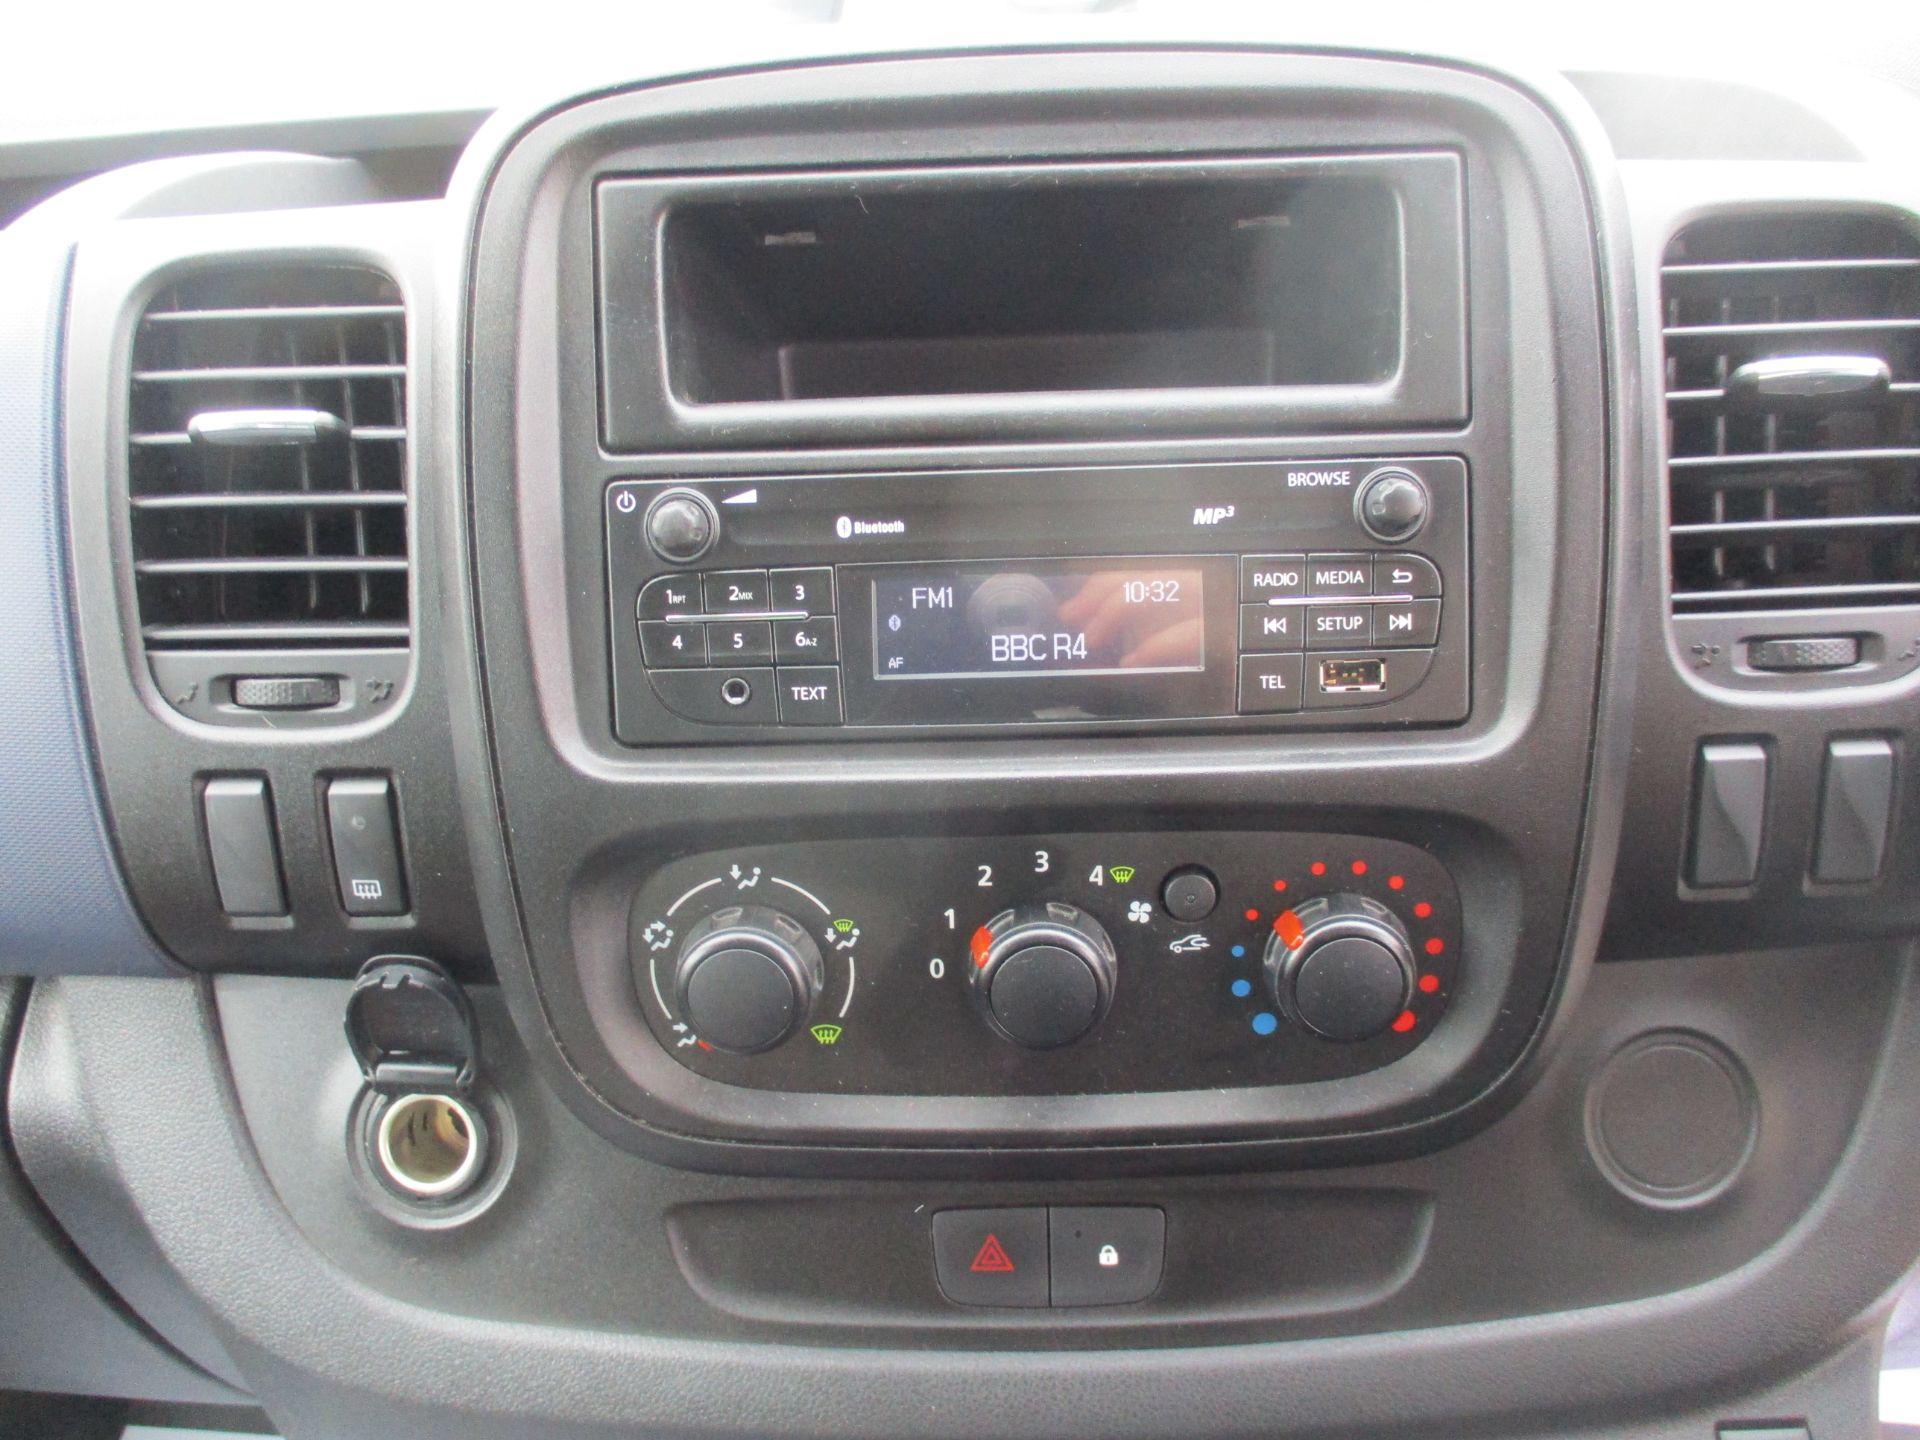 2017 Vauxhall Vivaro L2 H1 2900 1.6CDTI 120PS DOUBLE CAB  EURO 6 (DY67MYF) Image 15